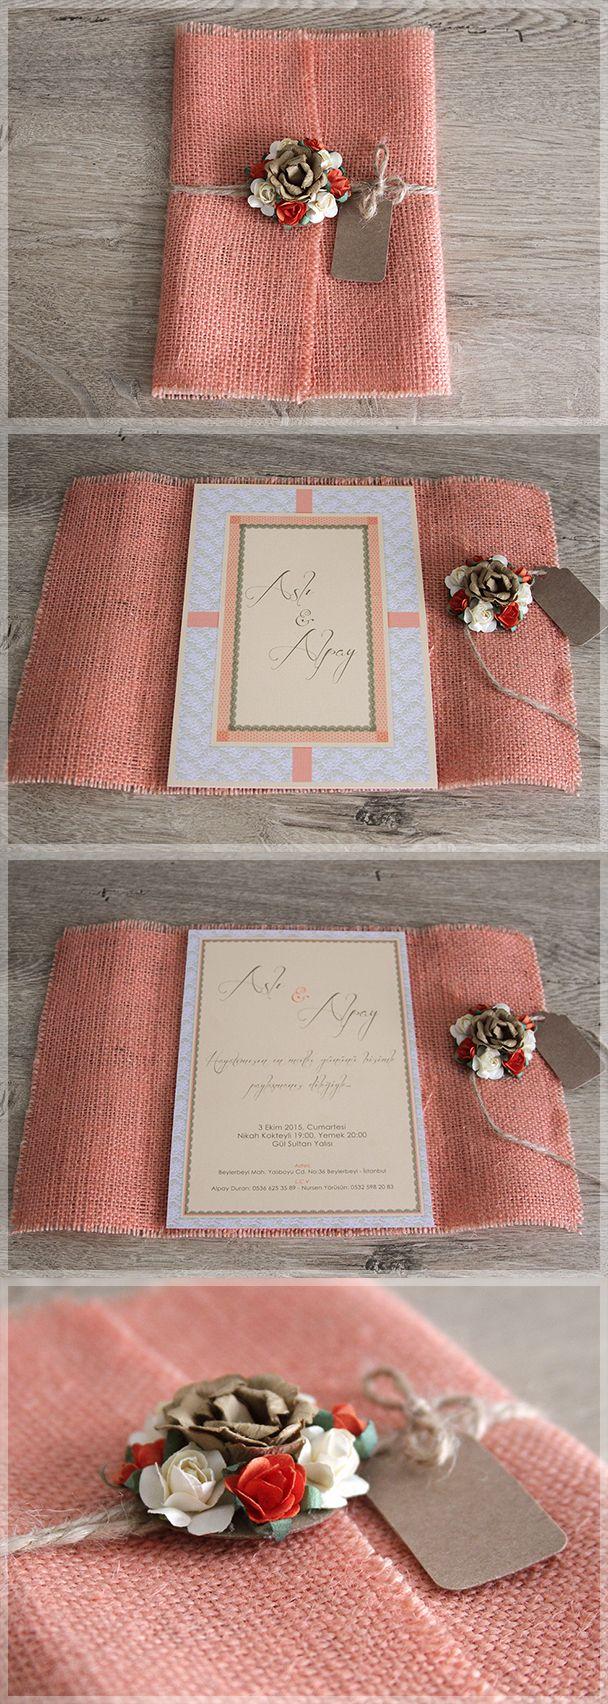 Restyling our Classical Beauty wedding invitation by covering with salmon pink burlap and adding colorful flowers for our bride&groom Asli&Alpay /// Aslı&Alpay için Classical Beauty modelimizi renkli çuval kumaşa sarıp çiçeklerle süsledik. Aslı&Alpay'a sonsuz mutluluklar diliyoruz. C.B. with Burlap, model no:D1013 bilgi&siparis icin: www.lovelycolors.com.tr